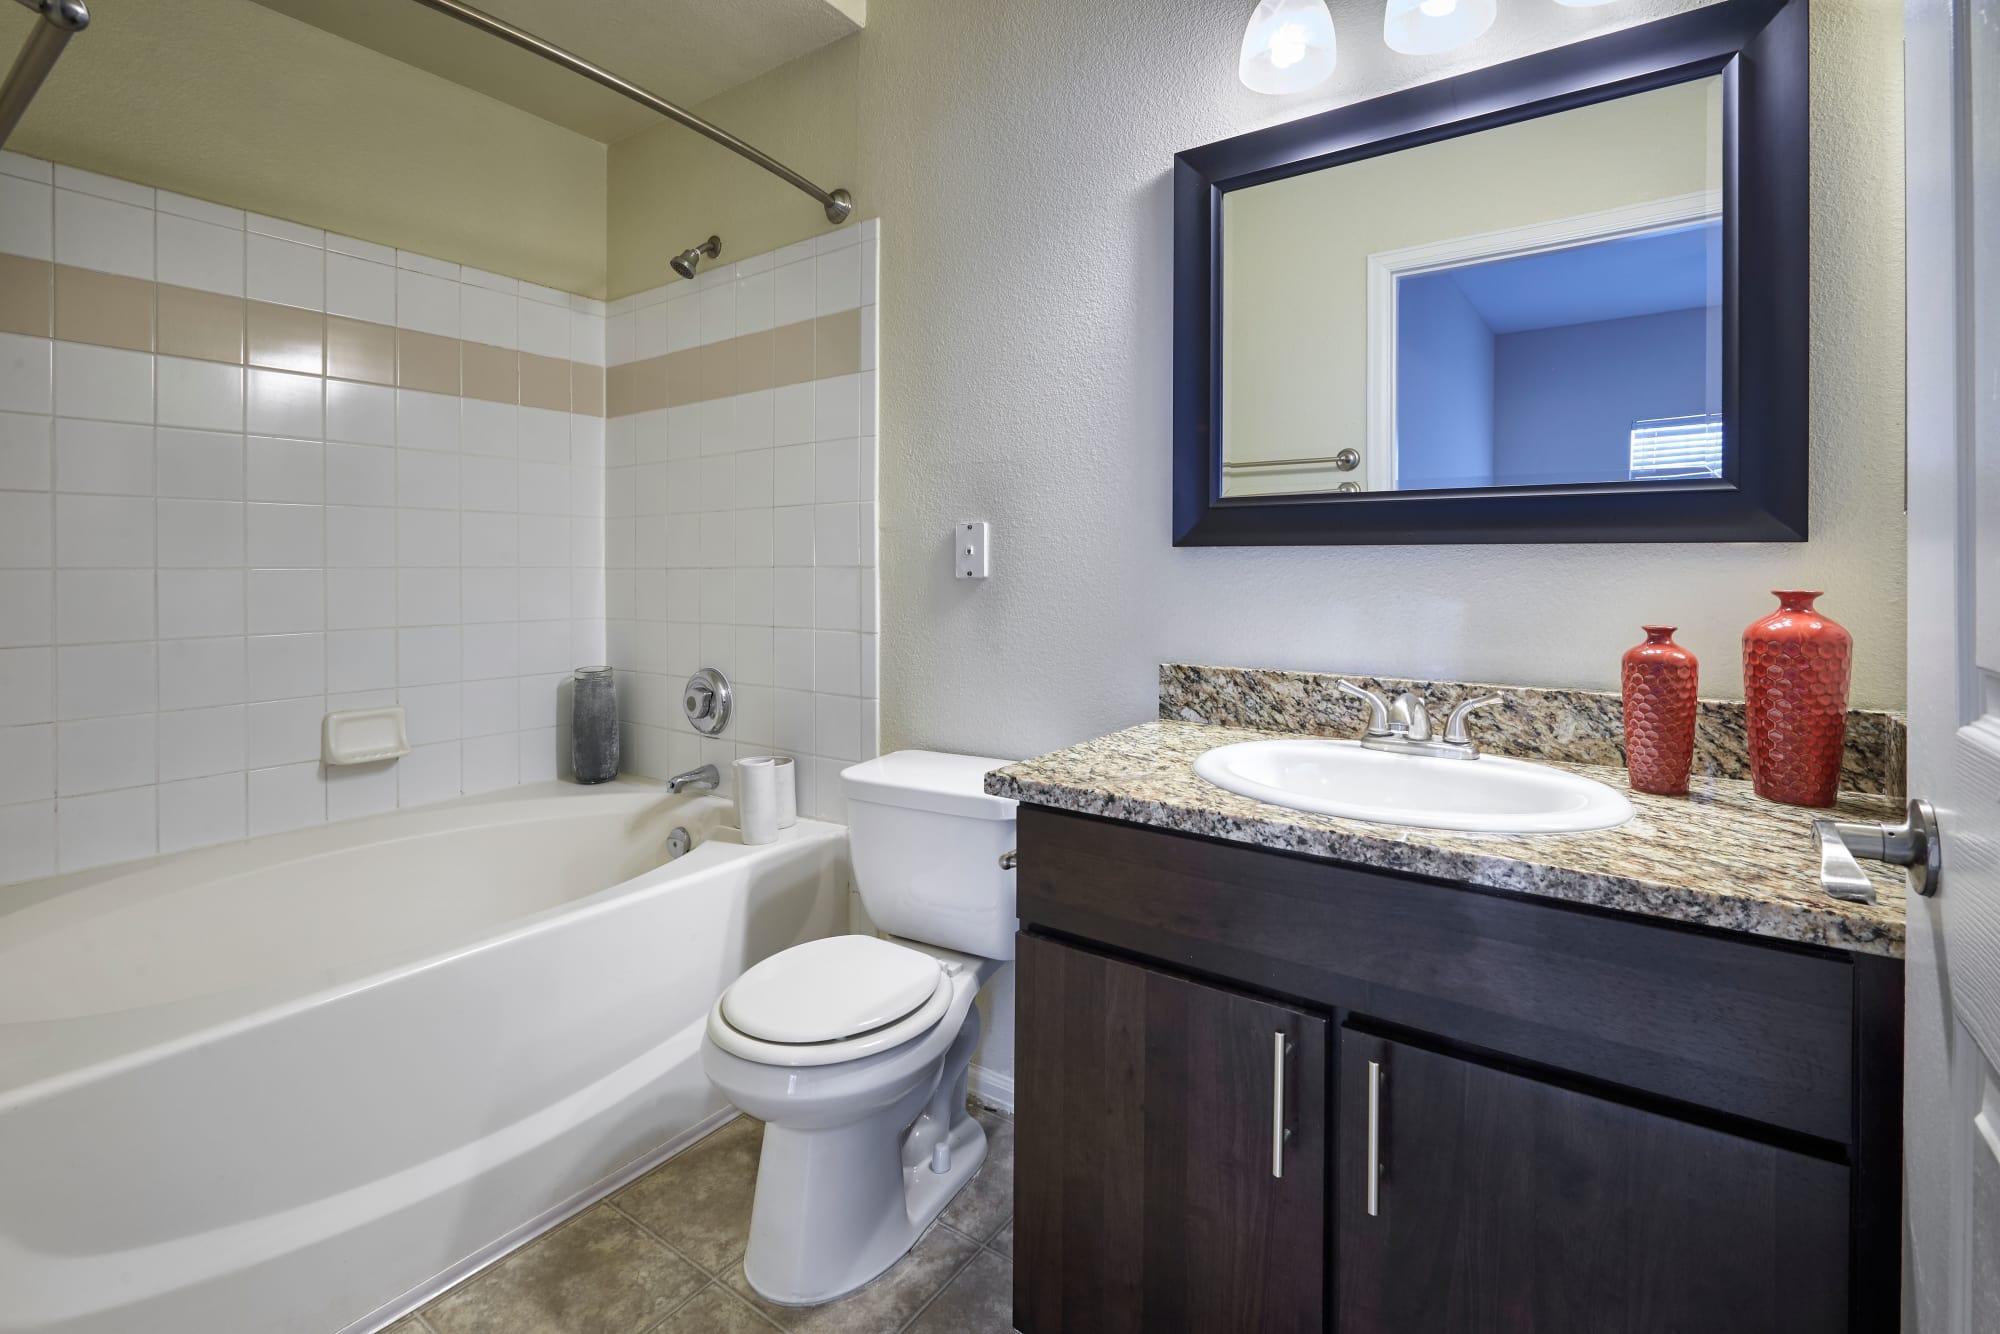 bathroom and tub - model home